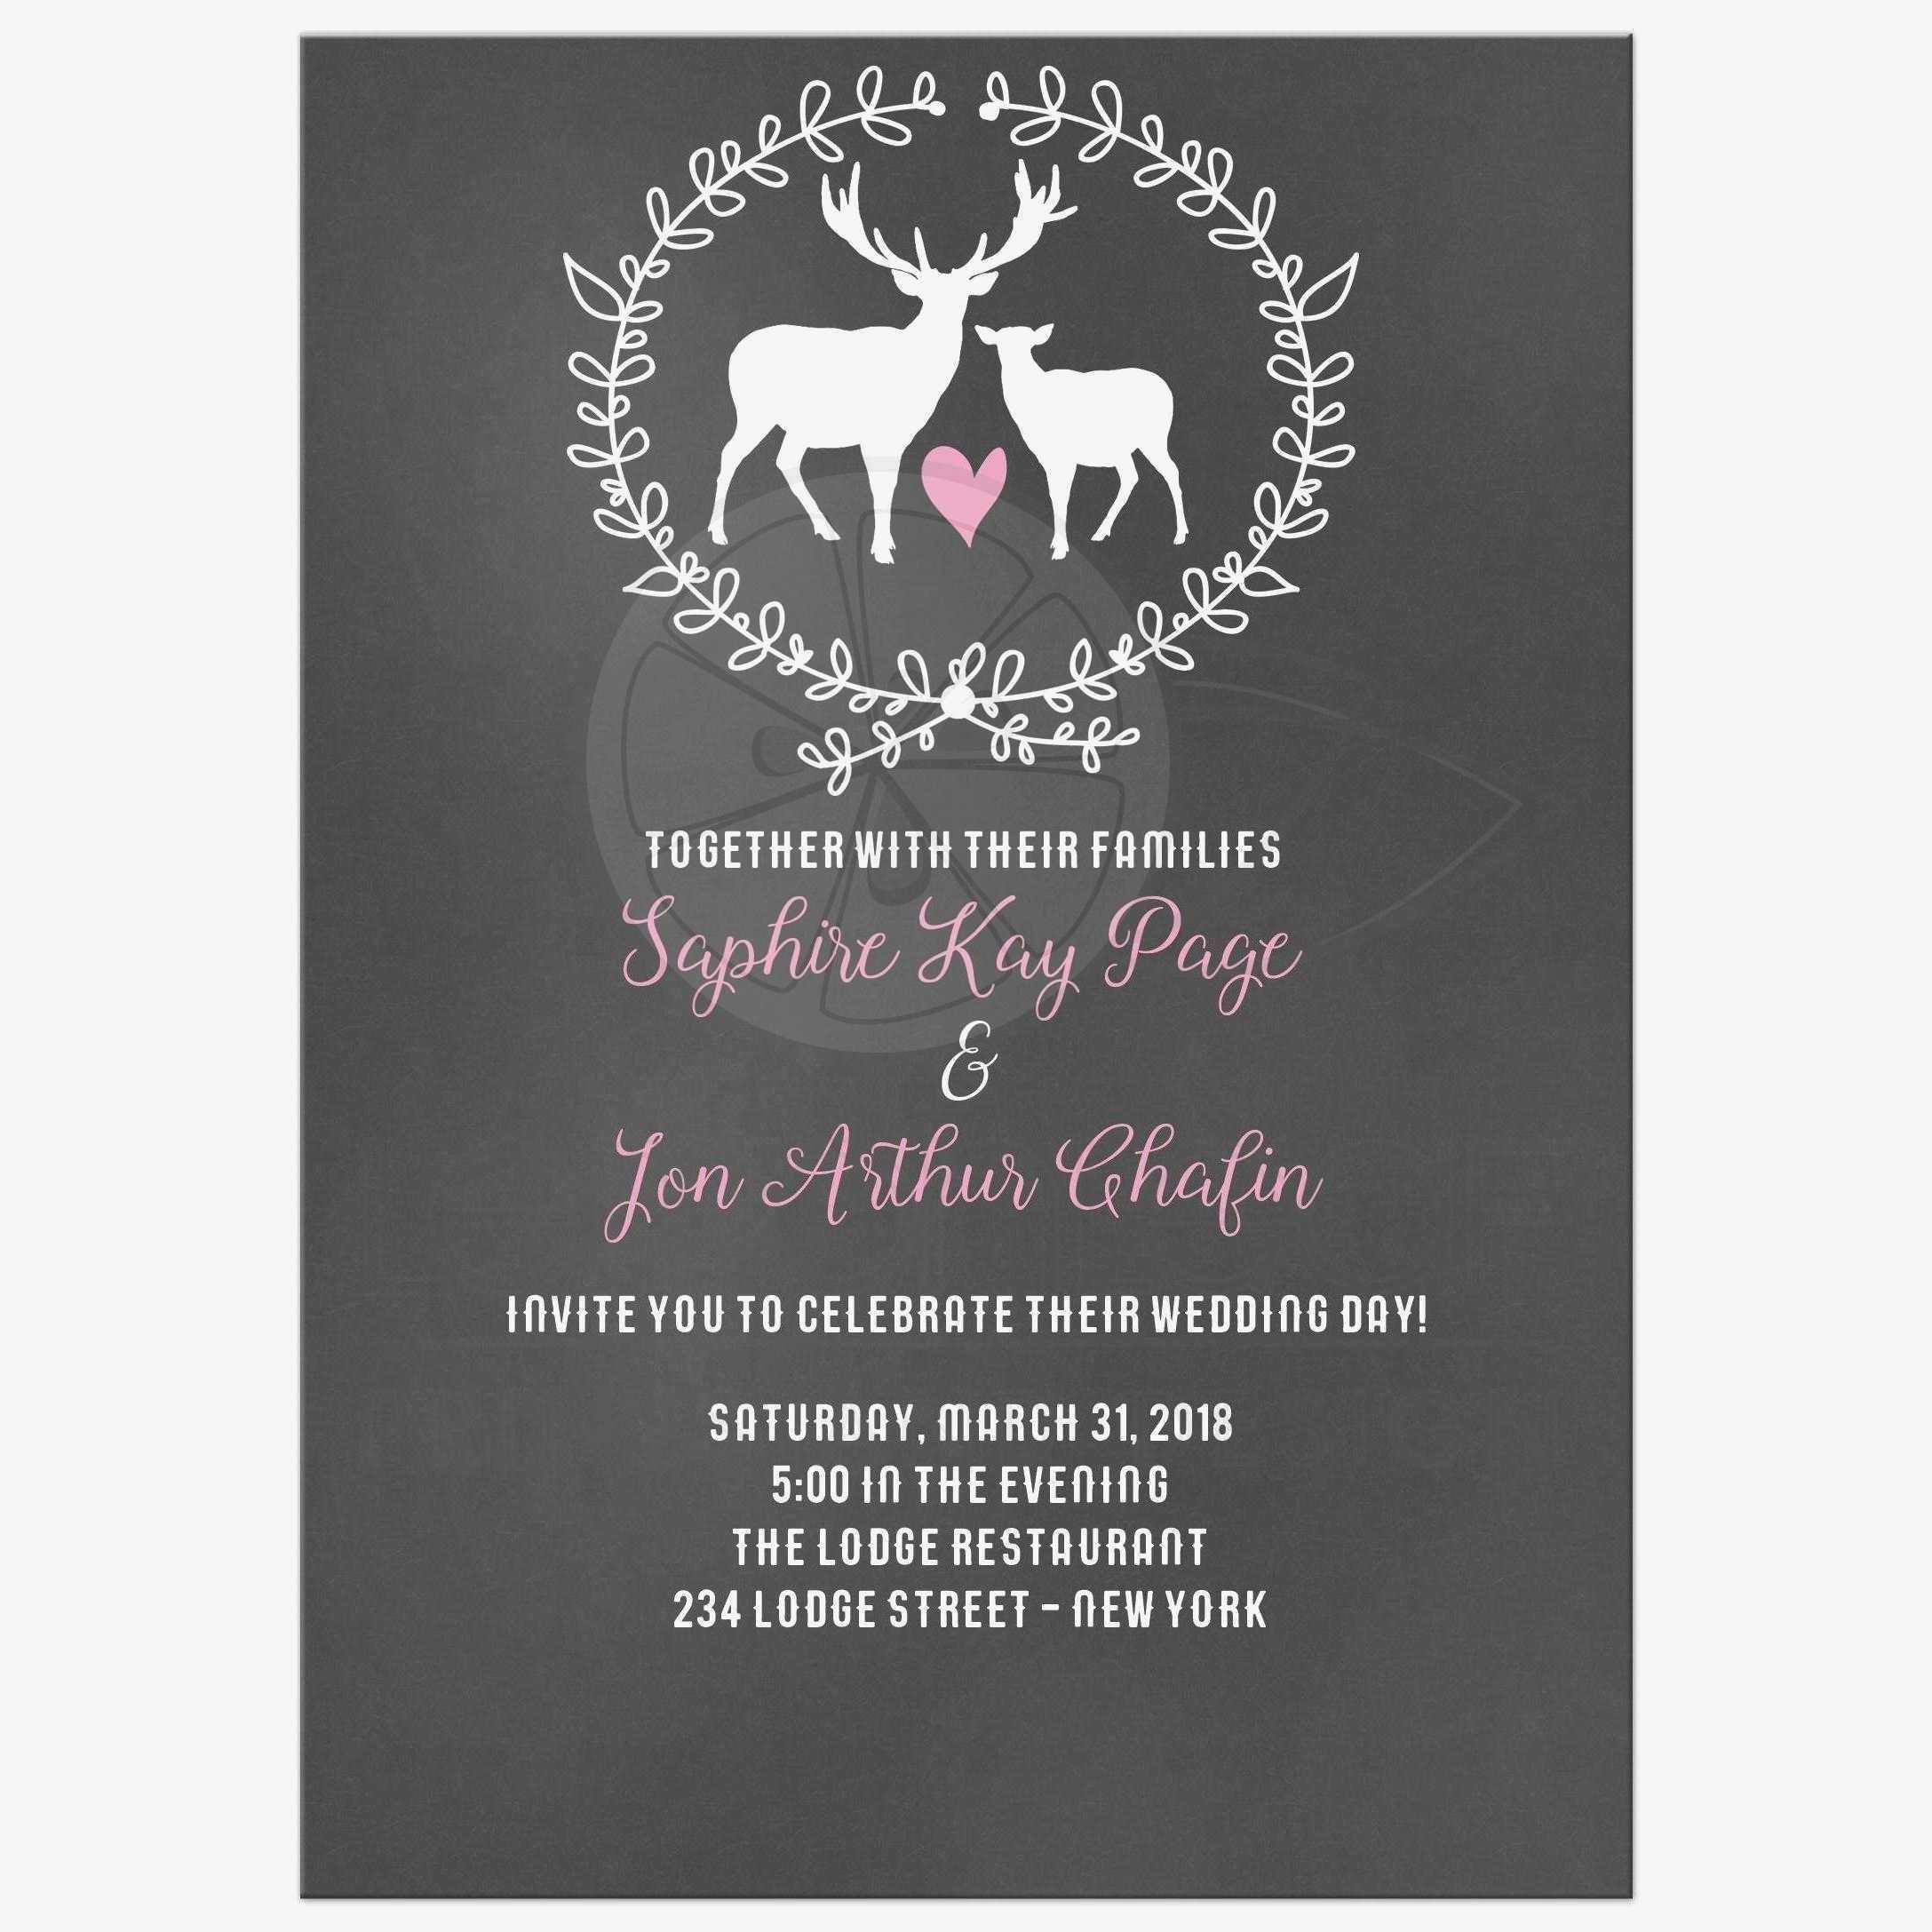 Bridal Shower Invitations Templates Download